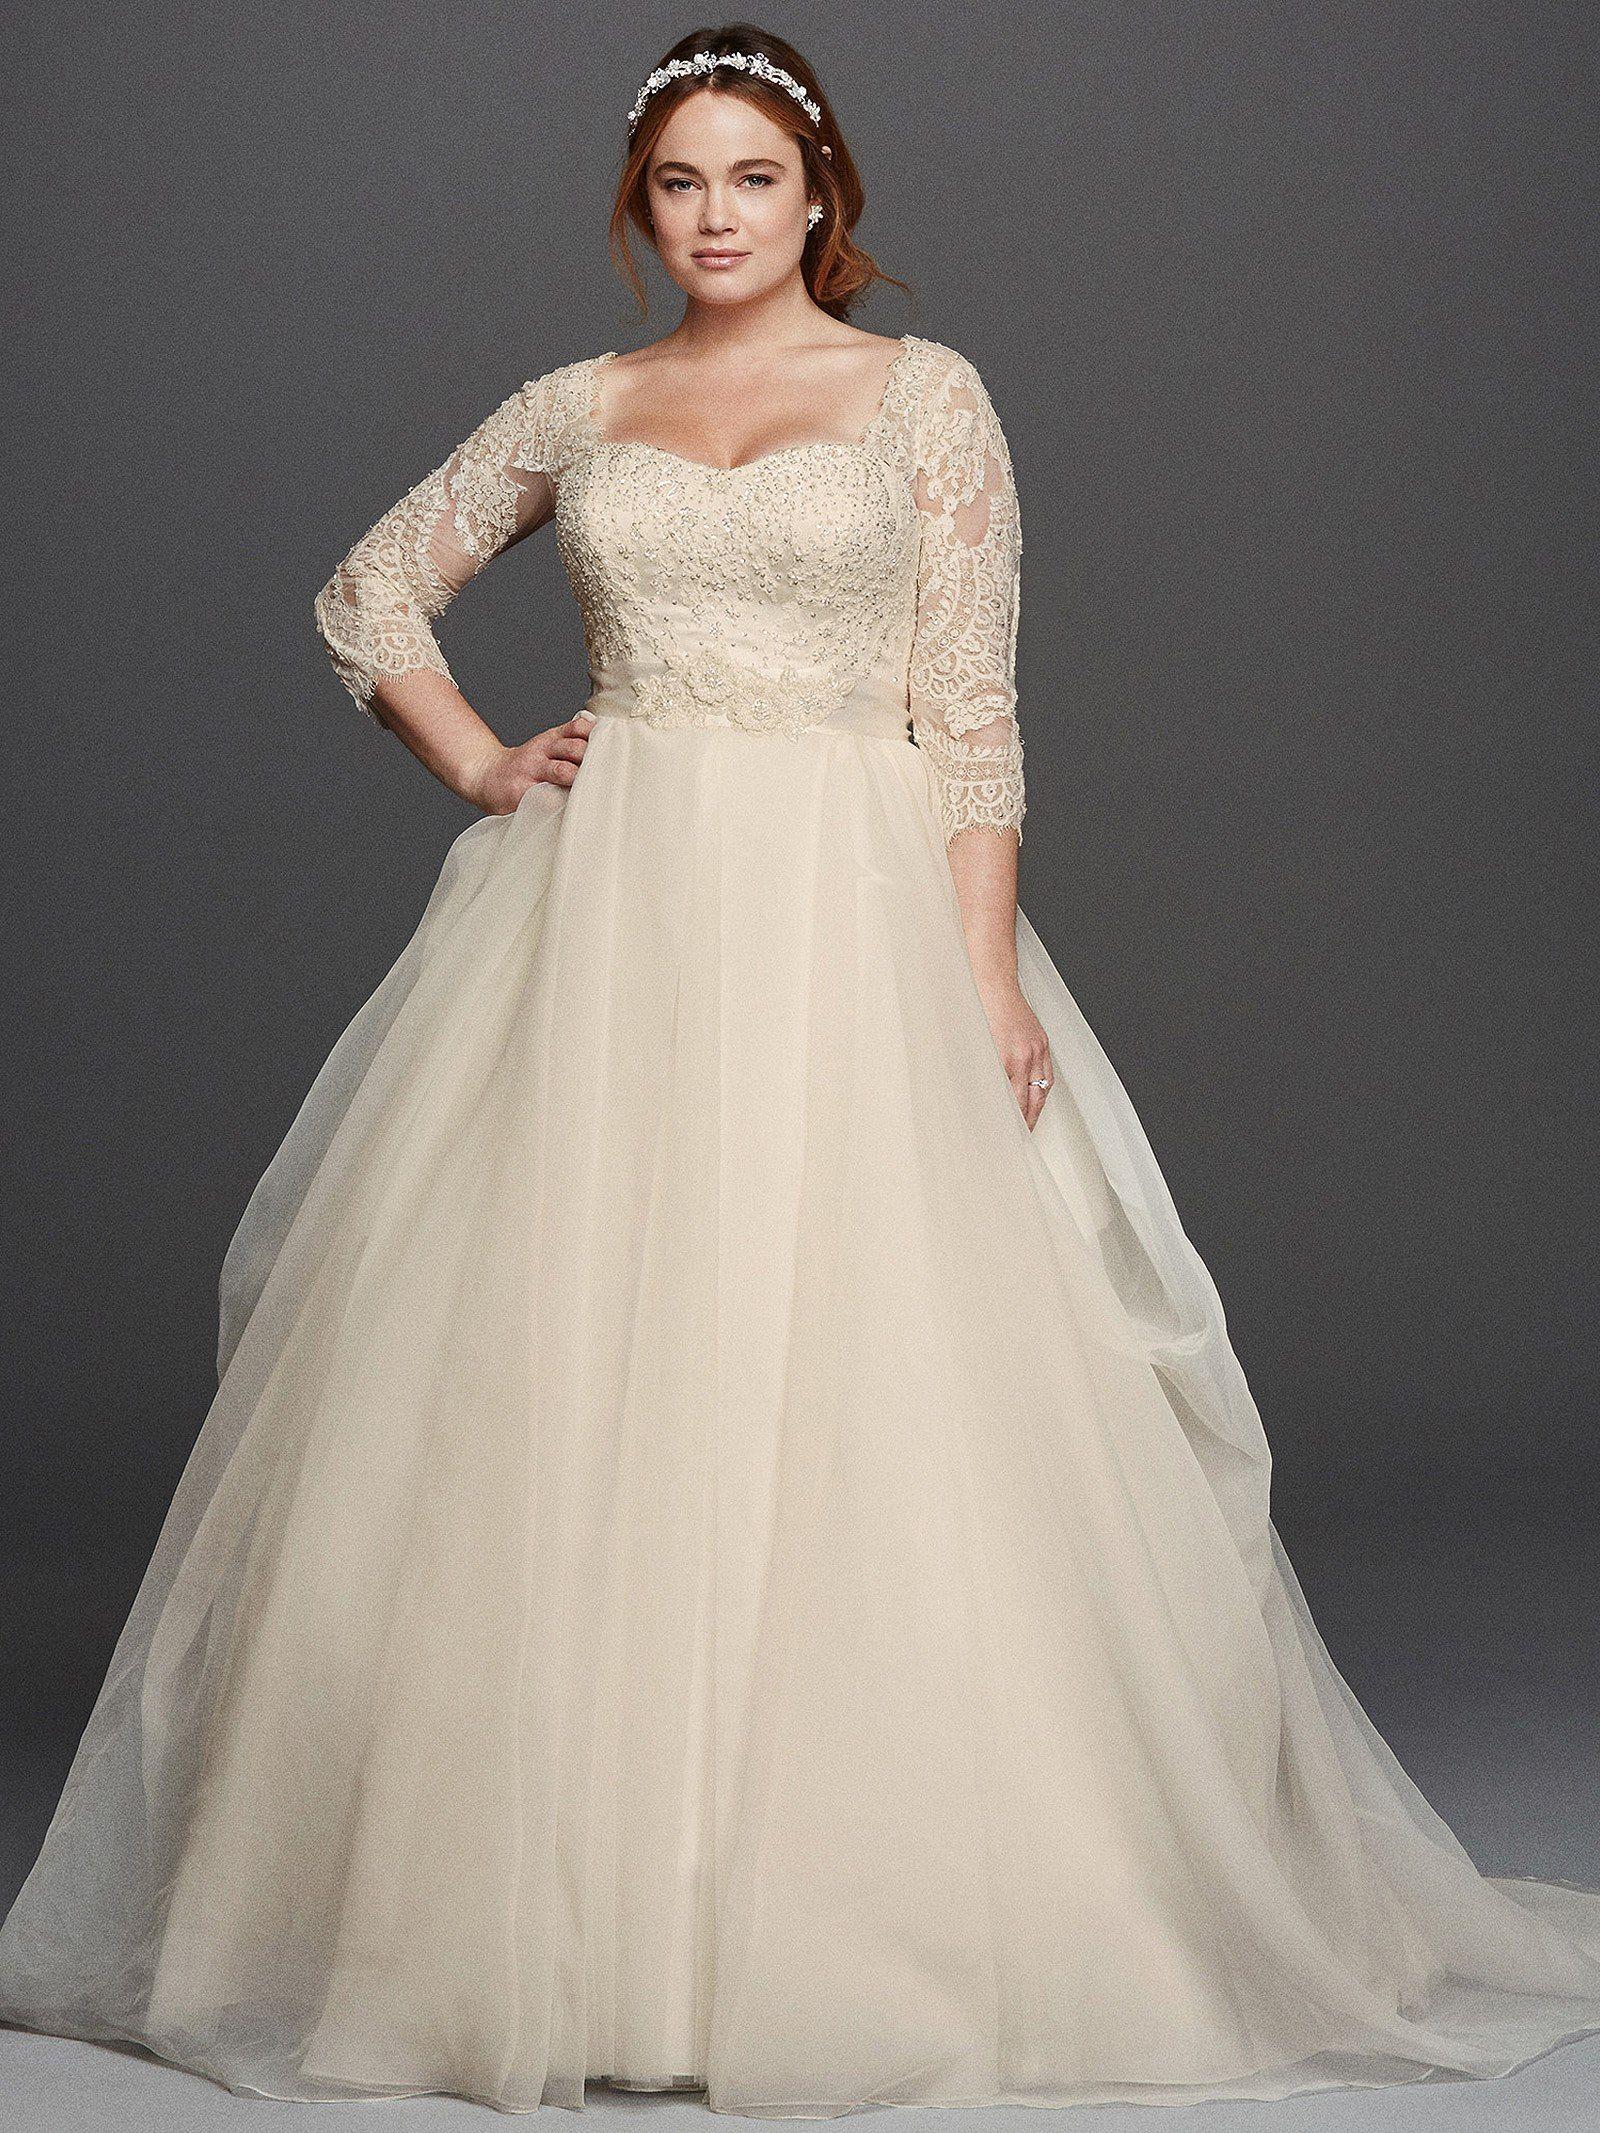 Oleg Cassini Woman | Wedding dresses / Vestidos de novia | Pinterest ...